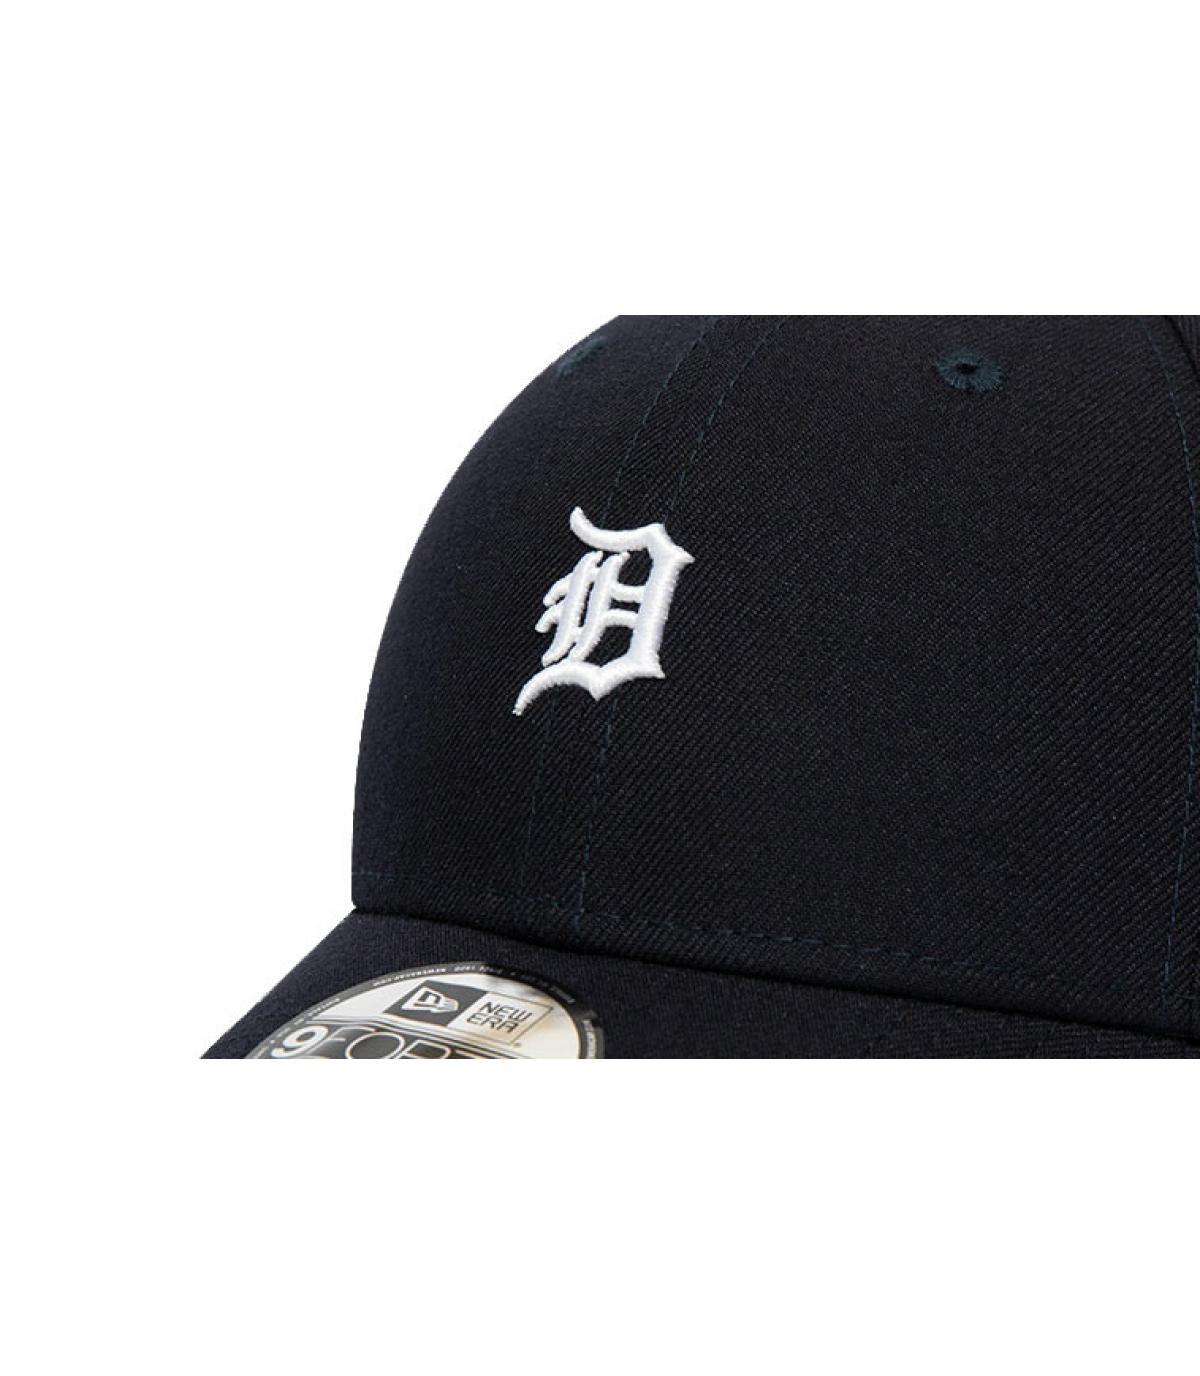 Details Cap MLB Tour Detroit 940 navy - Abbildung 3